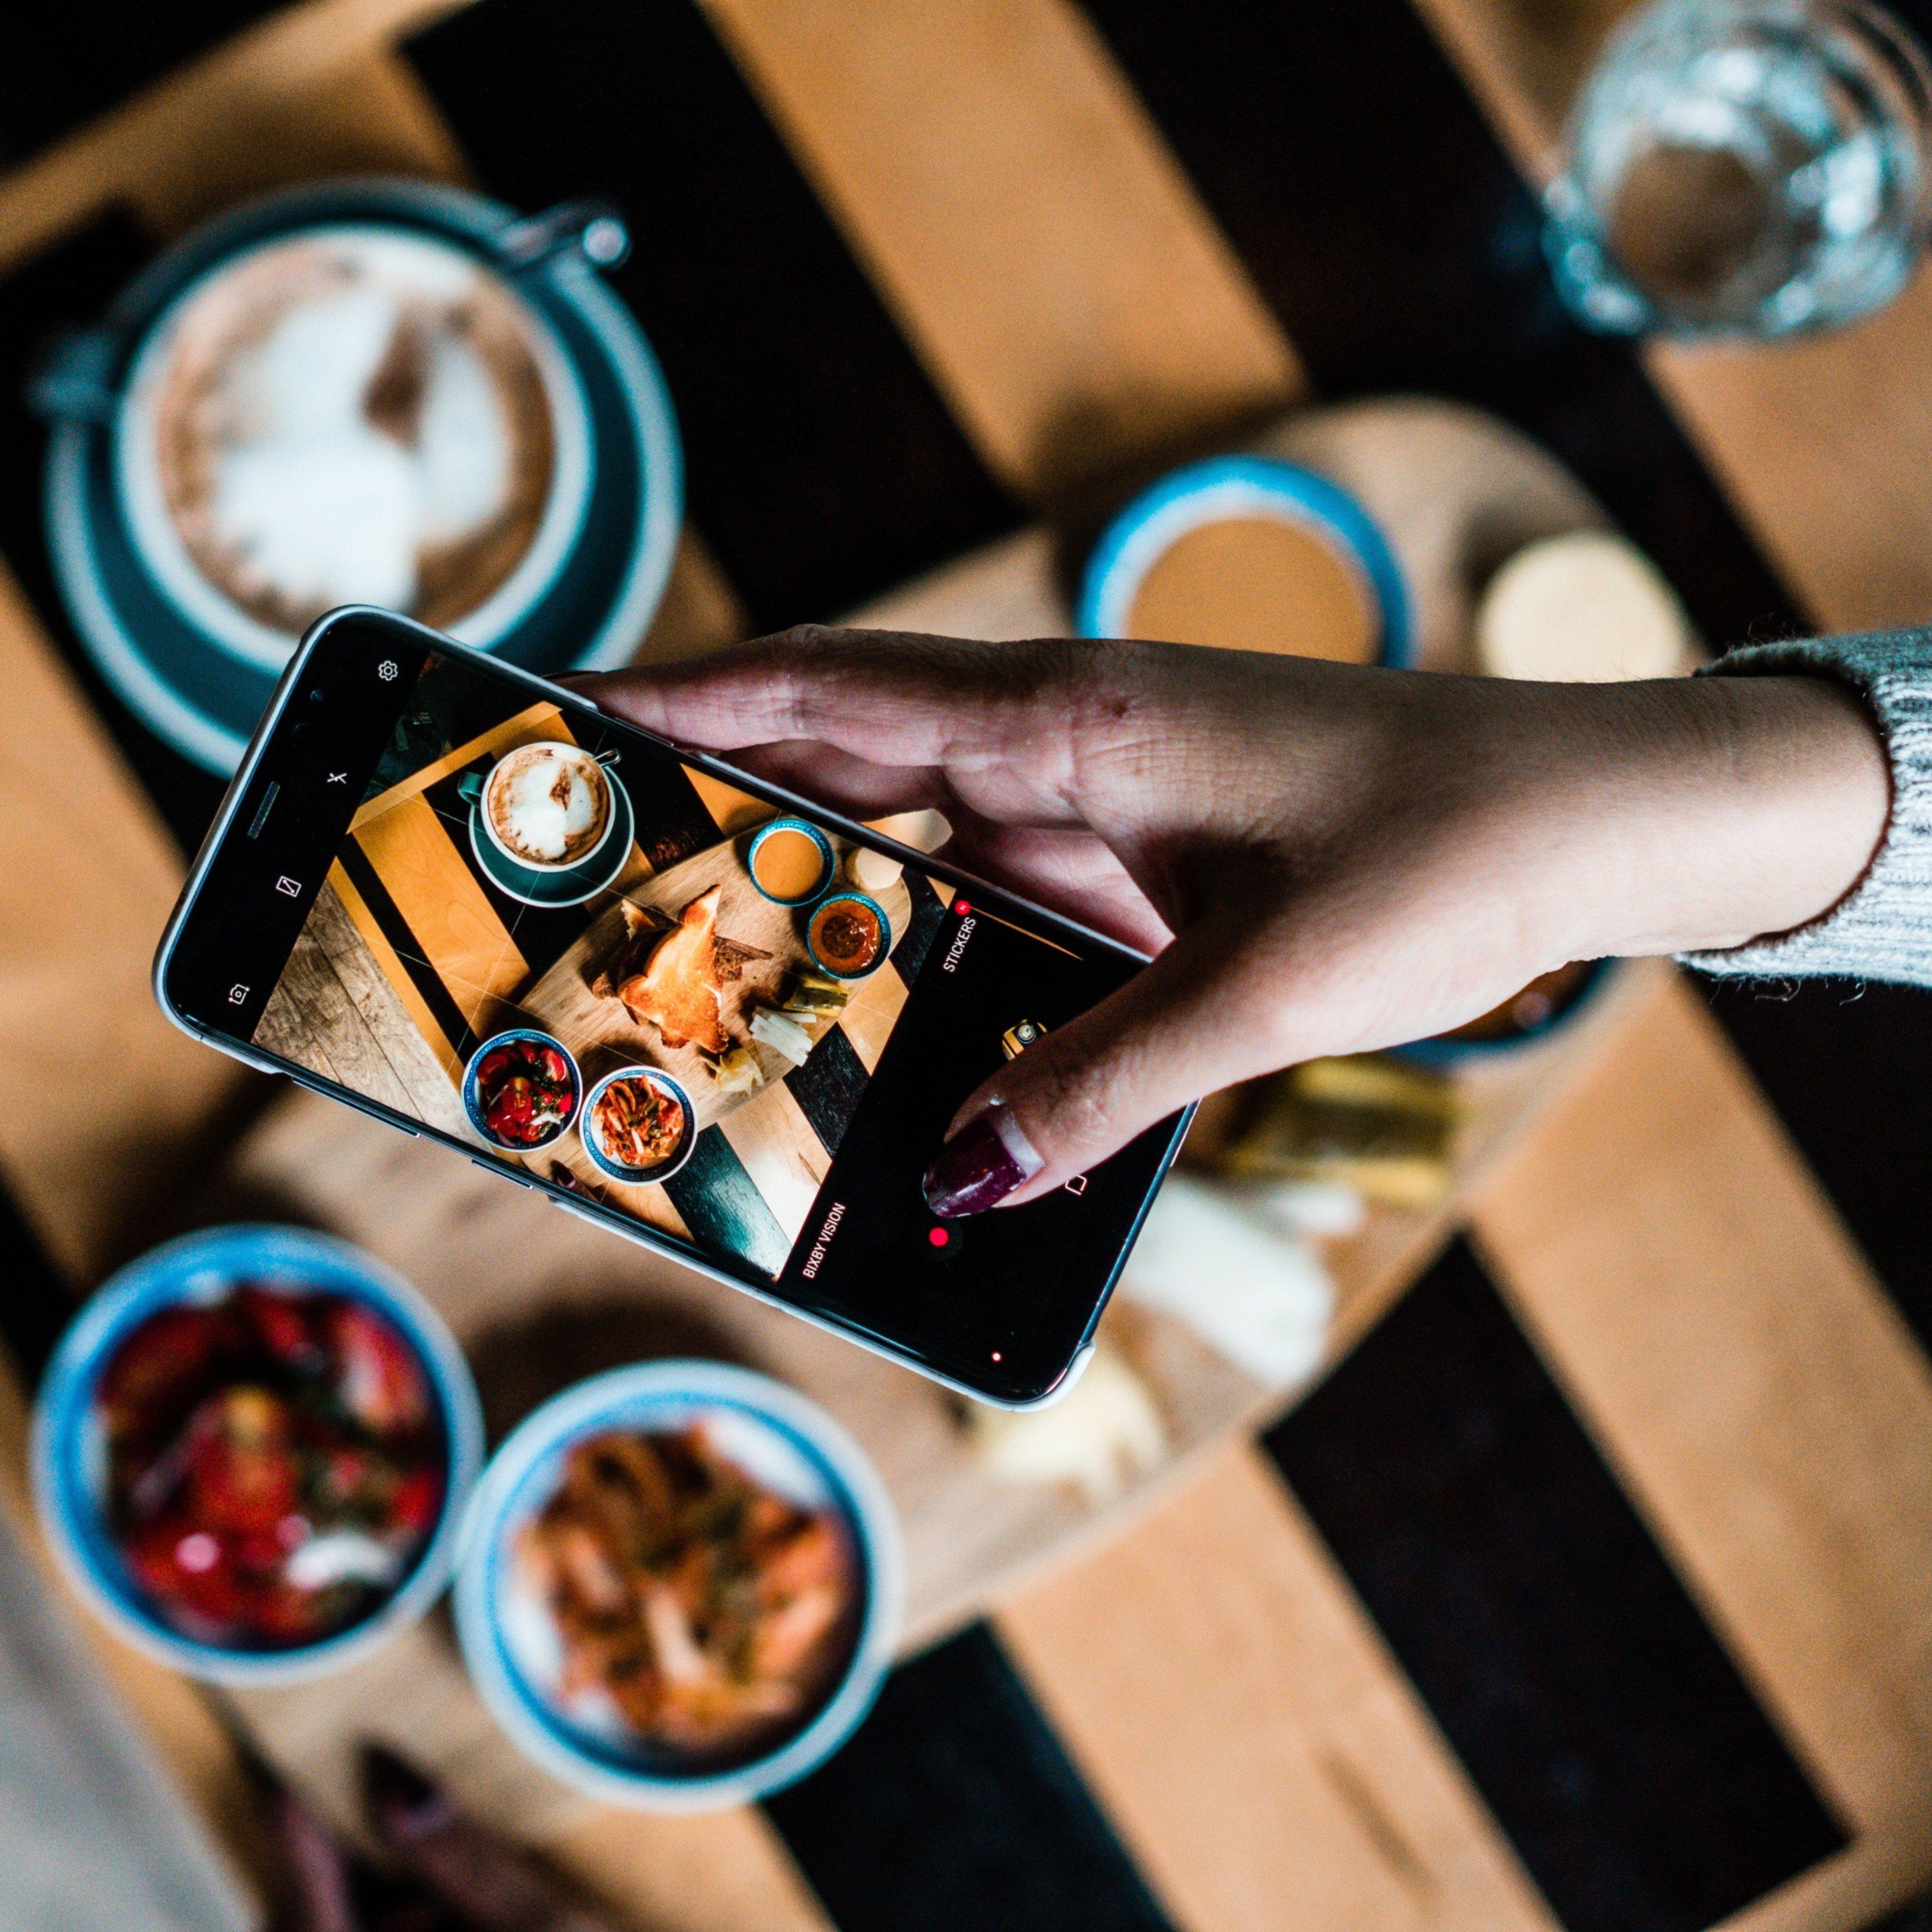 Diario de comidas Unsplash